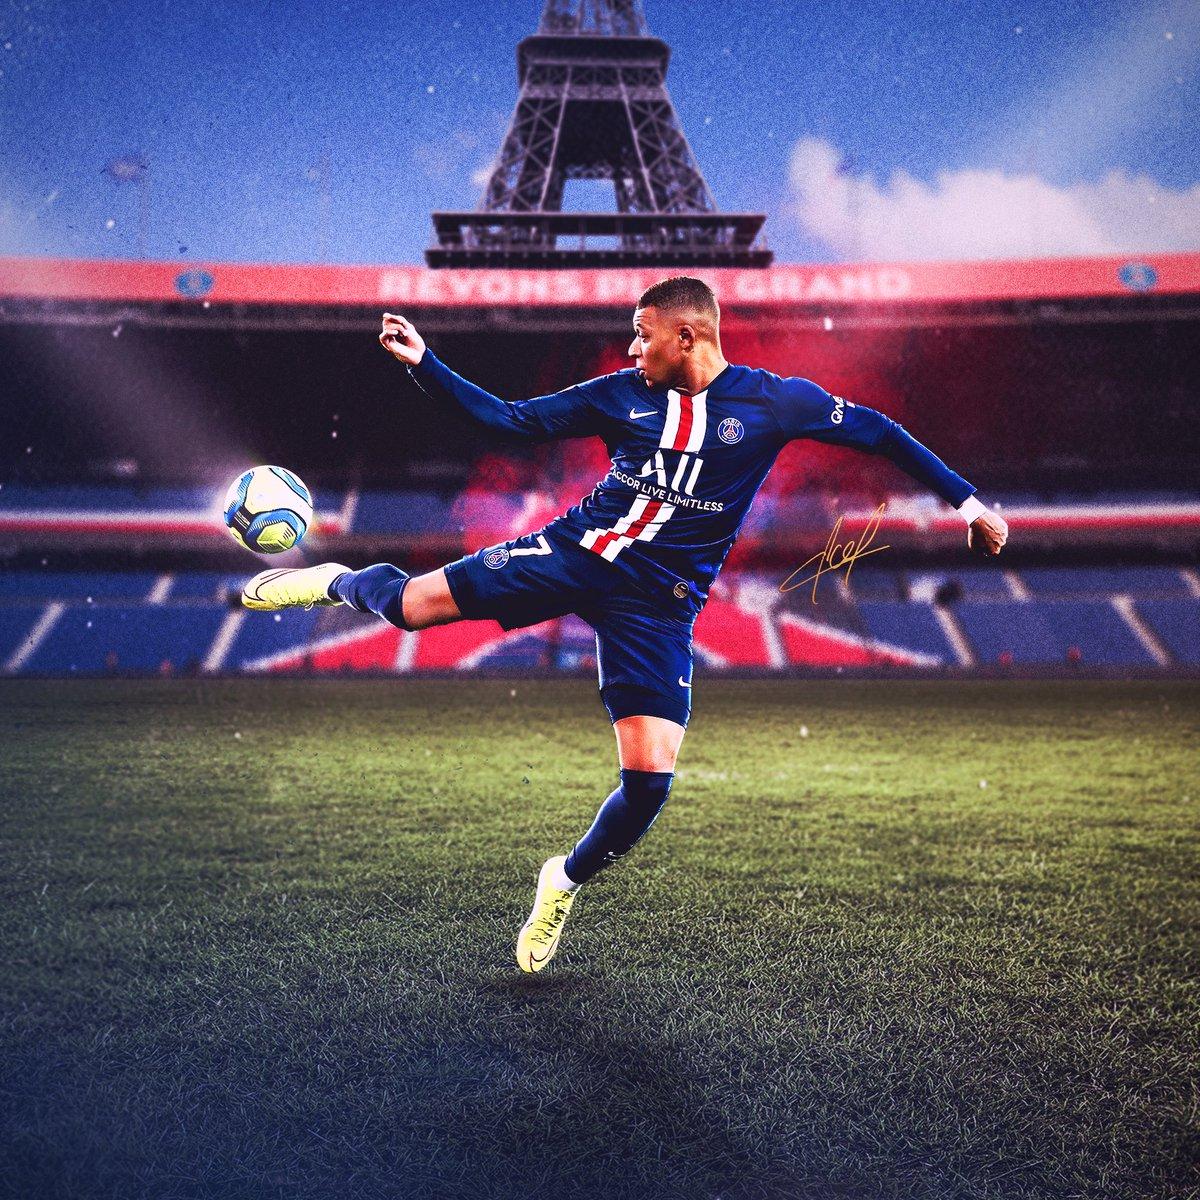 Kylian Mbappe | PSG ⚽️🇫🇷 #Mbappe #PSG